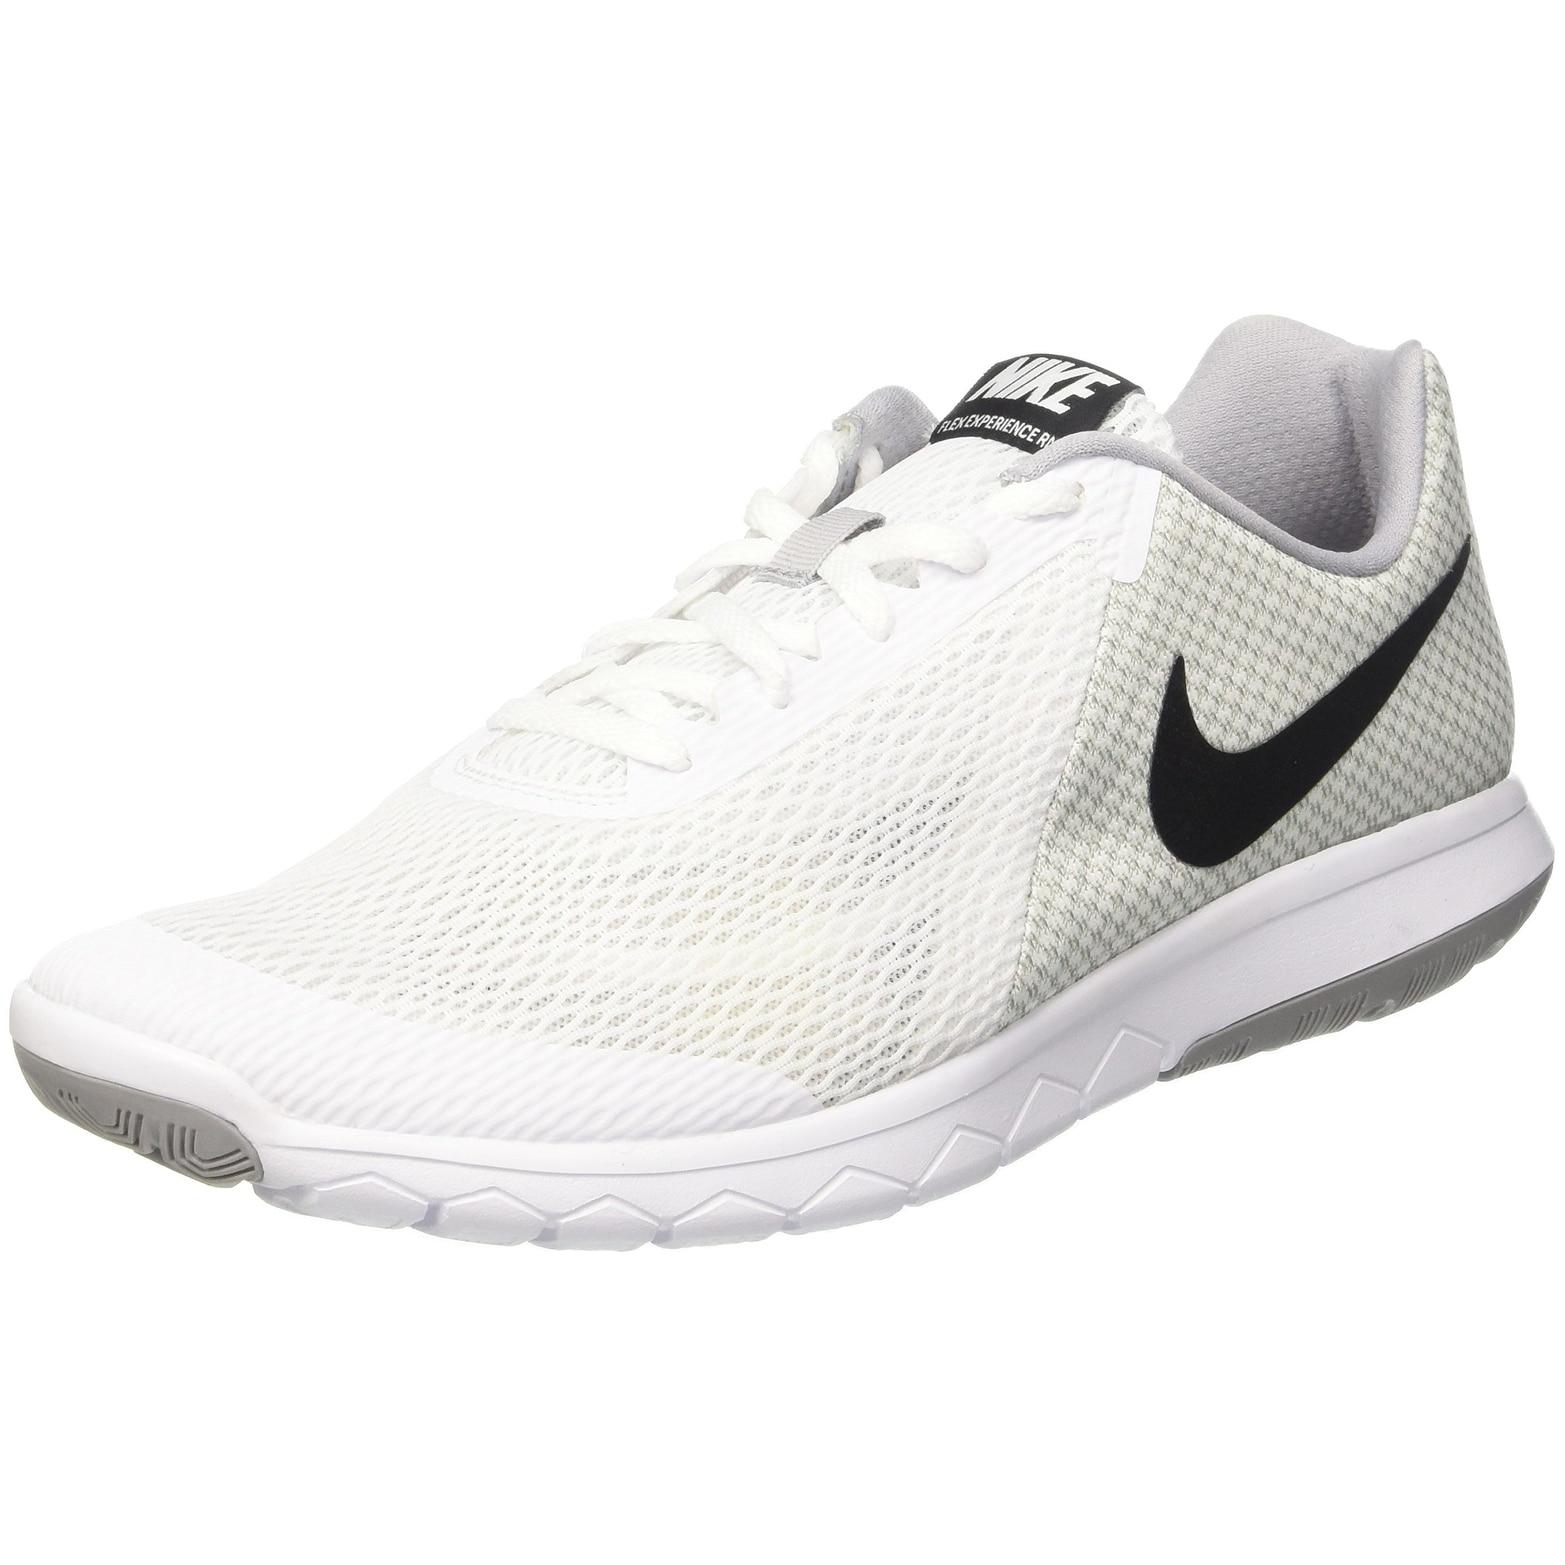 c03c698a4053b8 Men s Nike Flex Experience RN 6 Running Shoe White Black Wolf Grey - white  black wolf grey